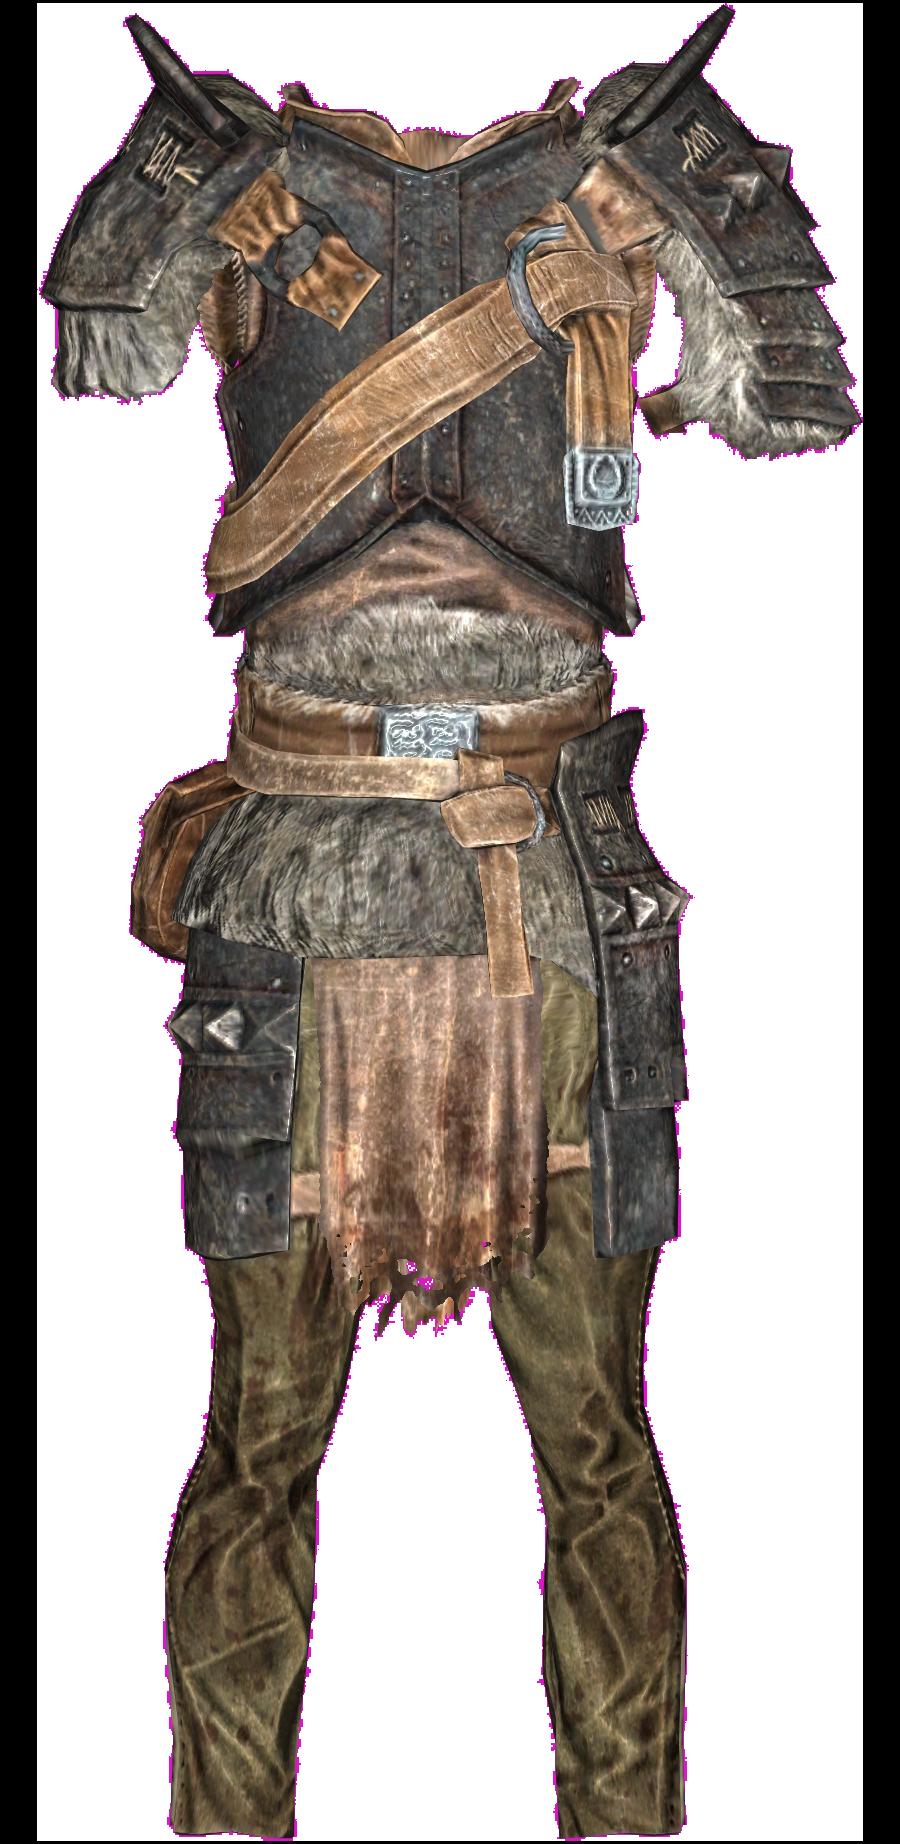 Banded Iron Armor Elder Scrolls Fandom Powered By Wikia